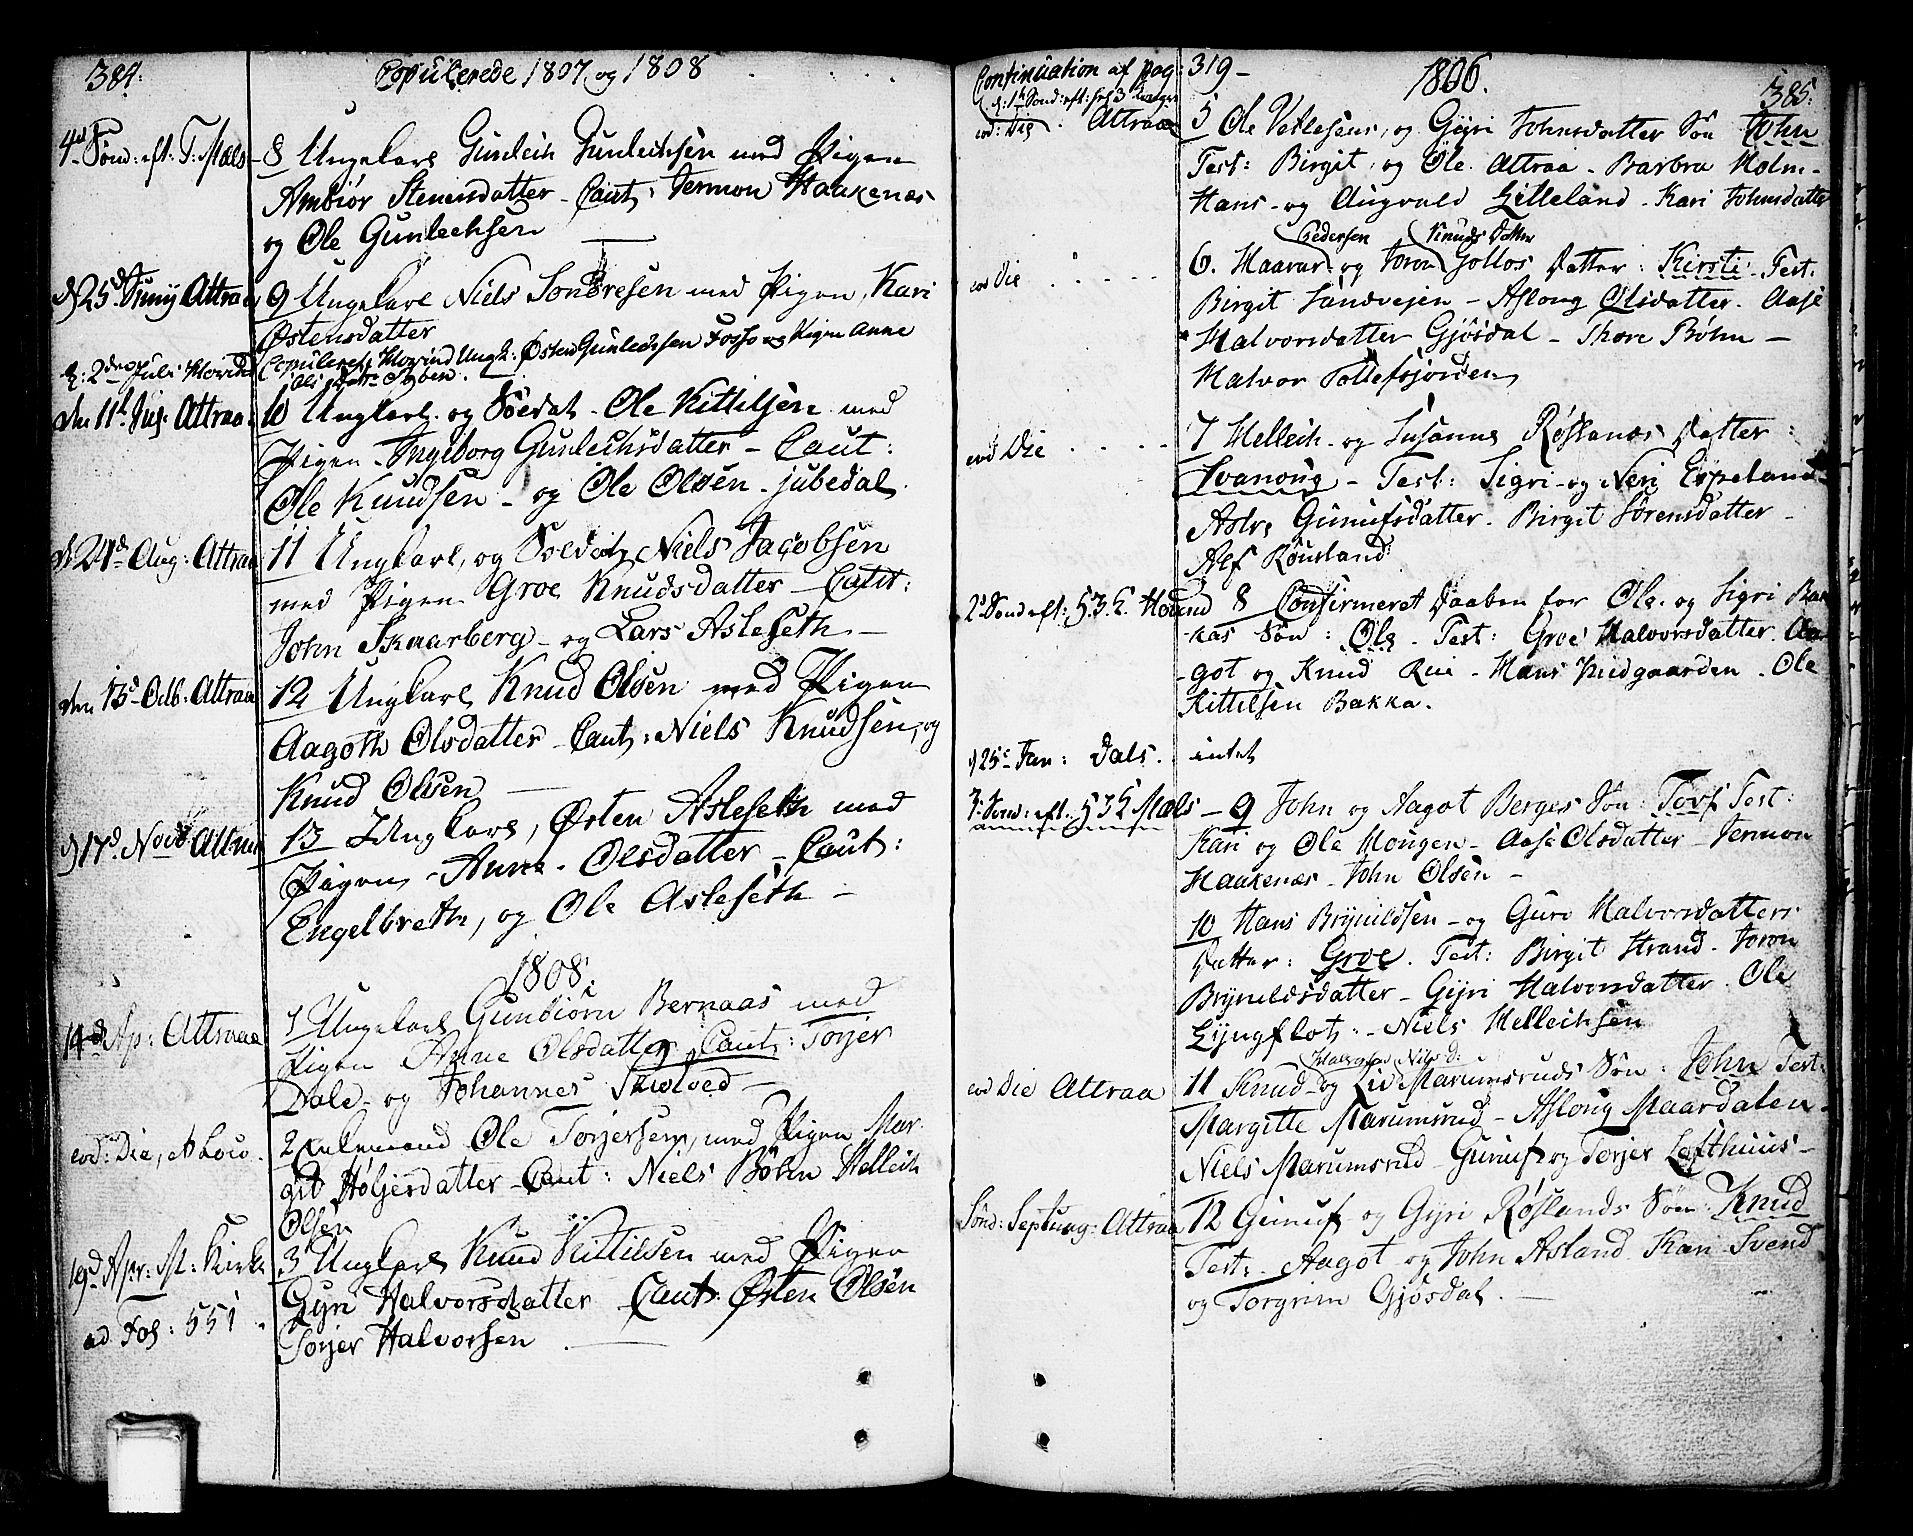 SAKO, Tinn kirkebøker, F/Fa/L0002: Ministerialbok nr. I 2, 1757-1810, s. 384-385